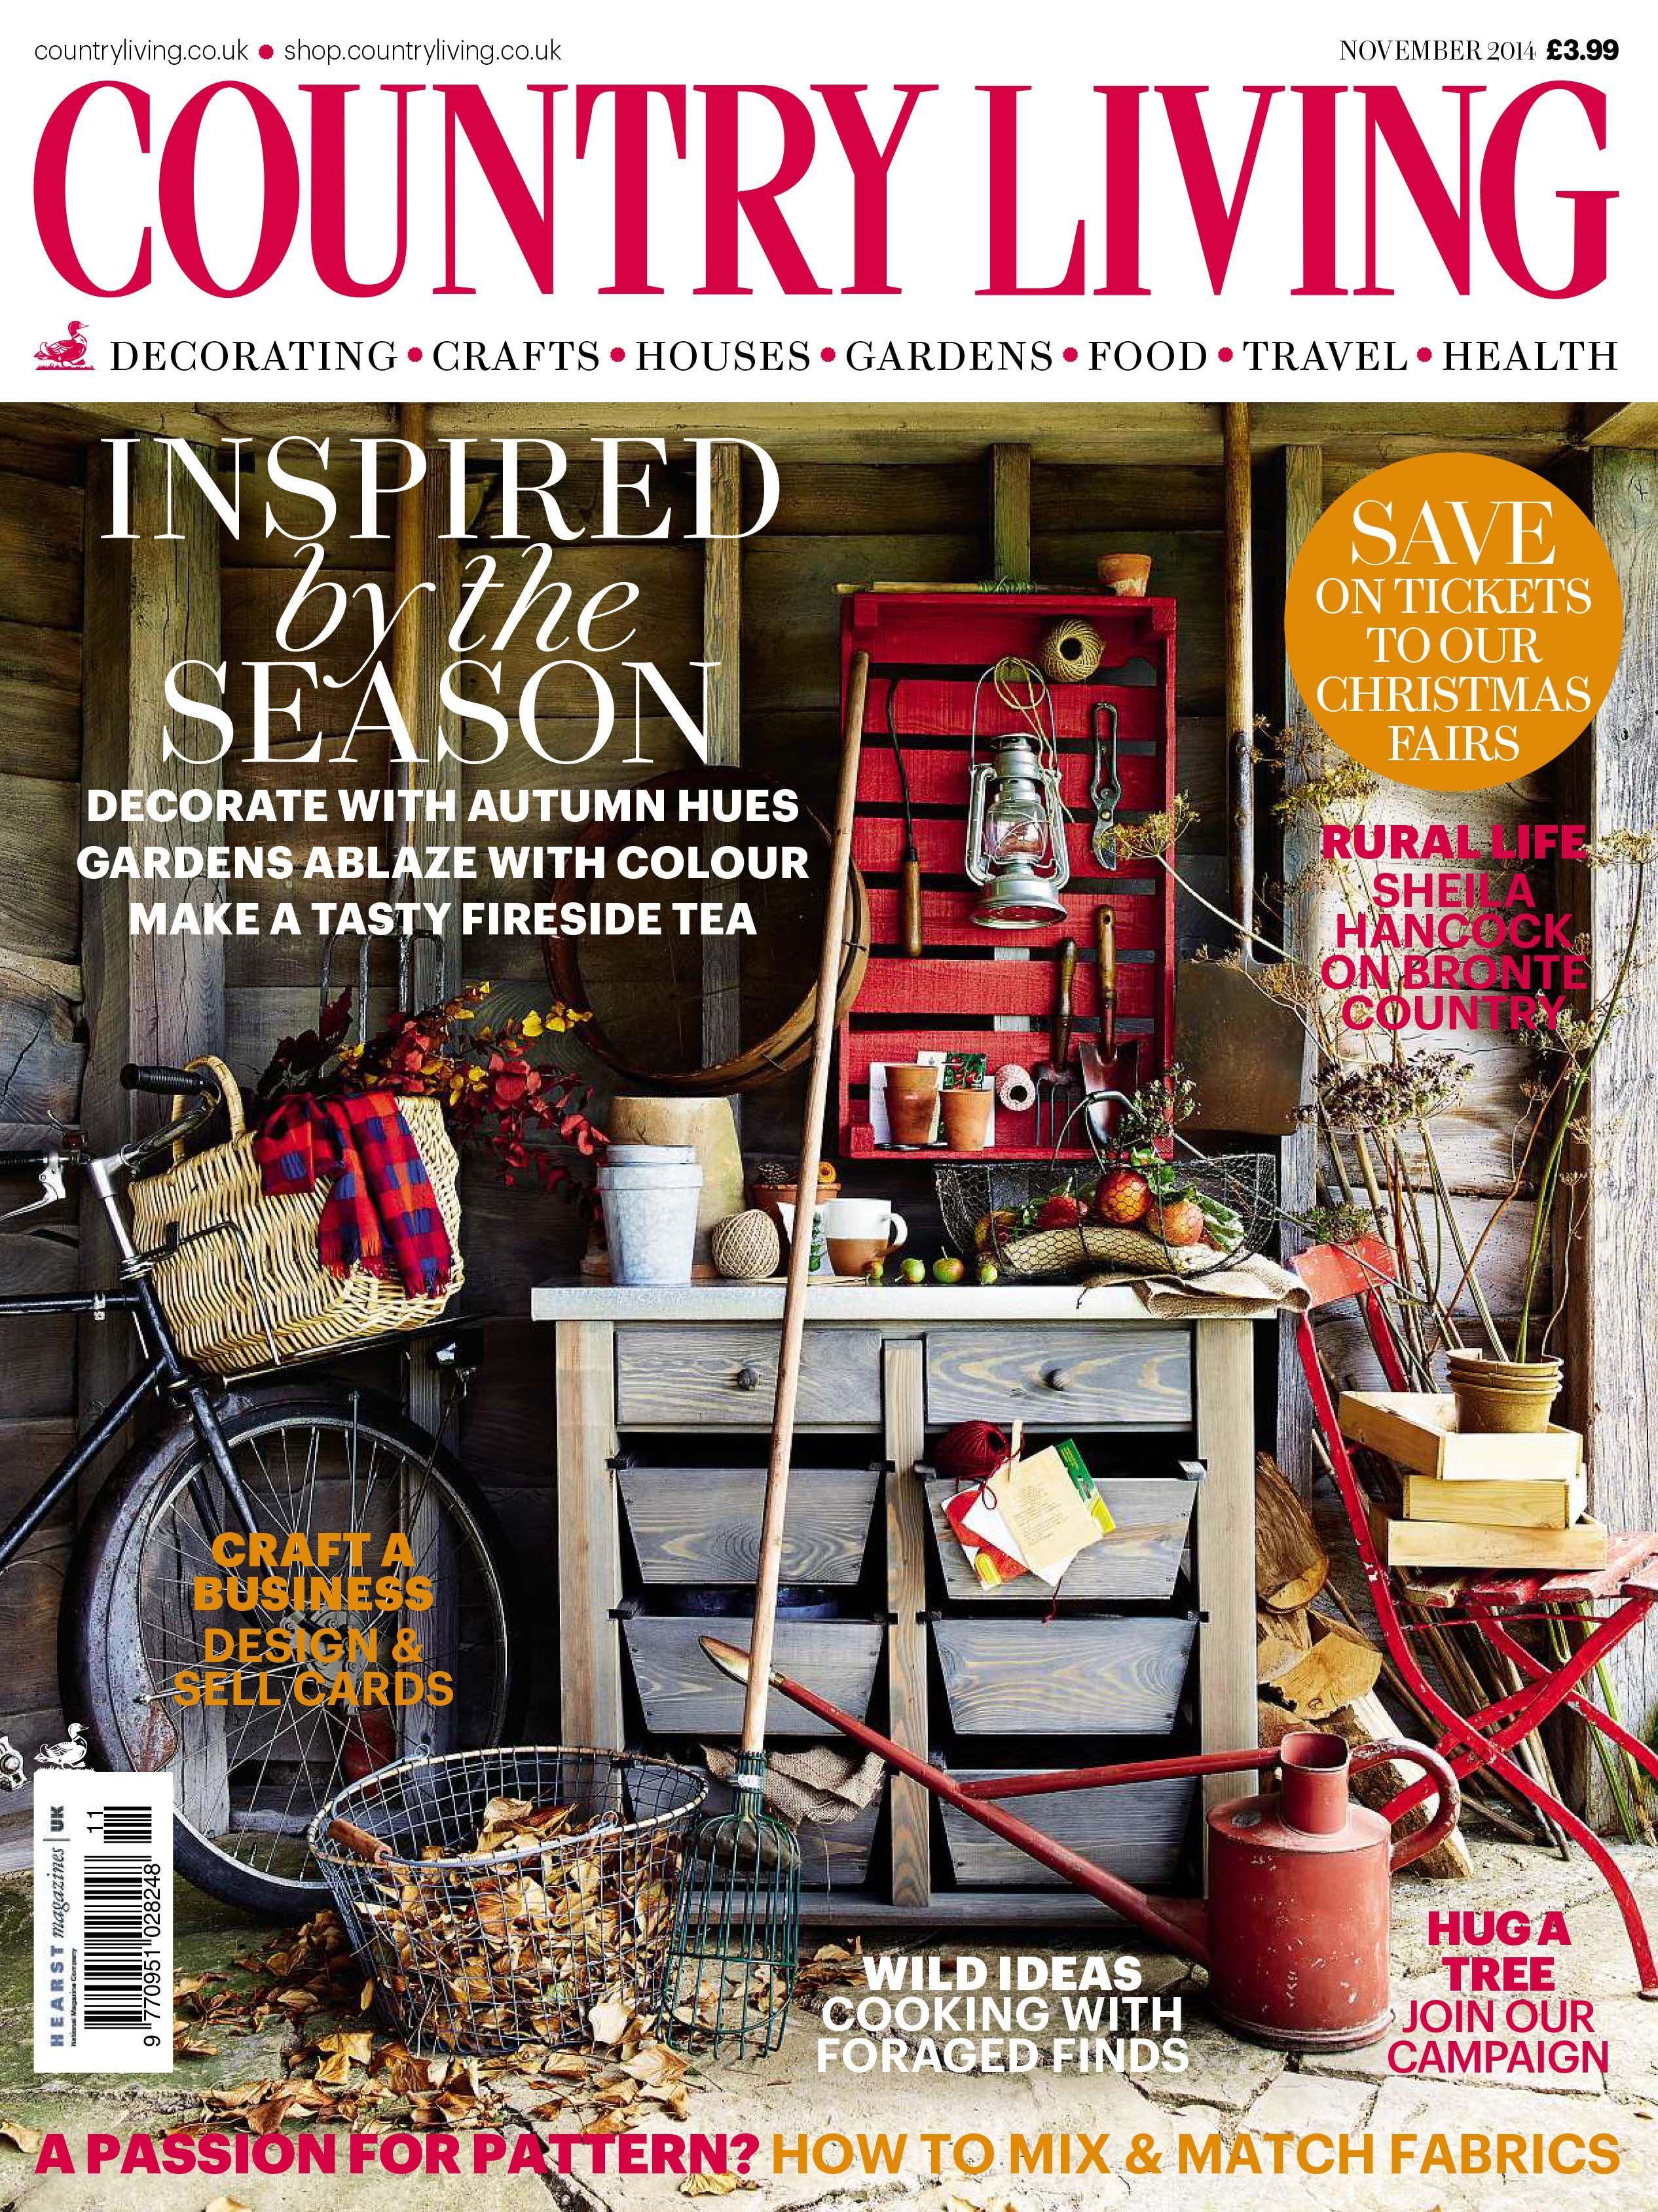 Country Living Magazine November 2014 Cover Countryliving Co Uk Country Living Country Living Uk Country Living Magazine